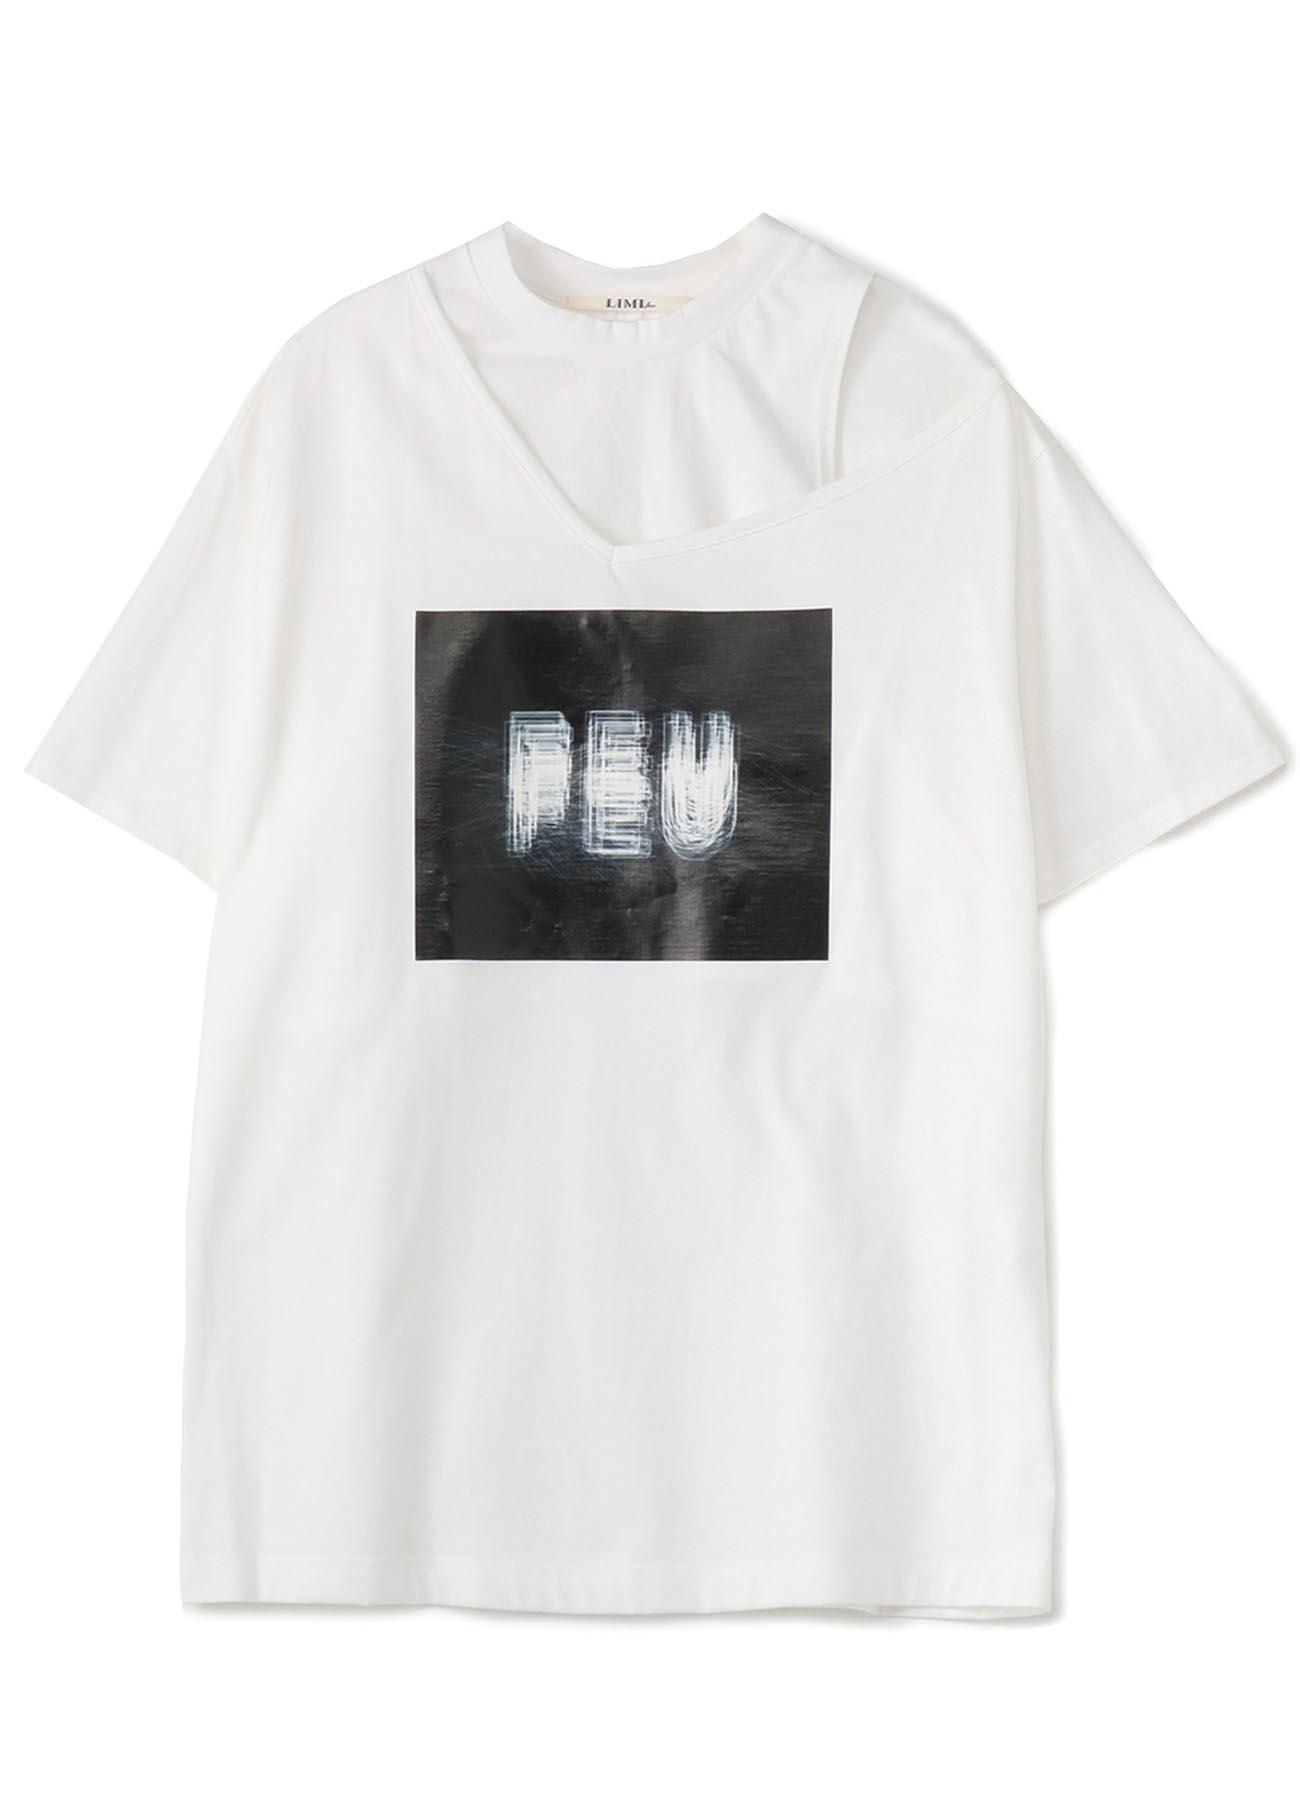 Neon [FEU] Print Layered T